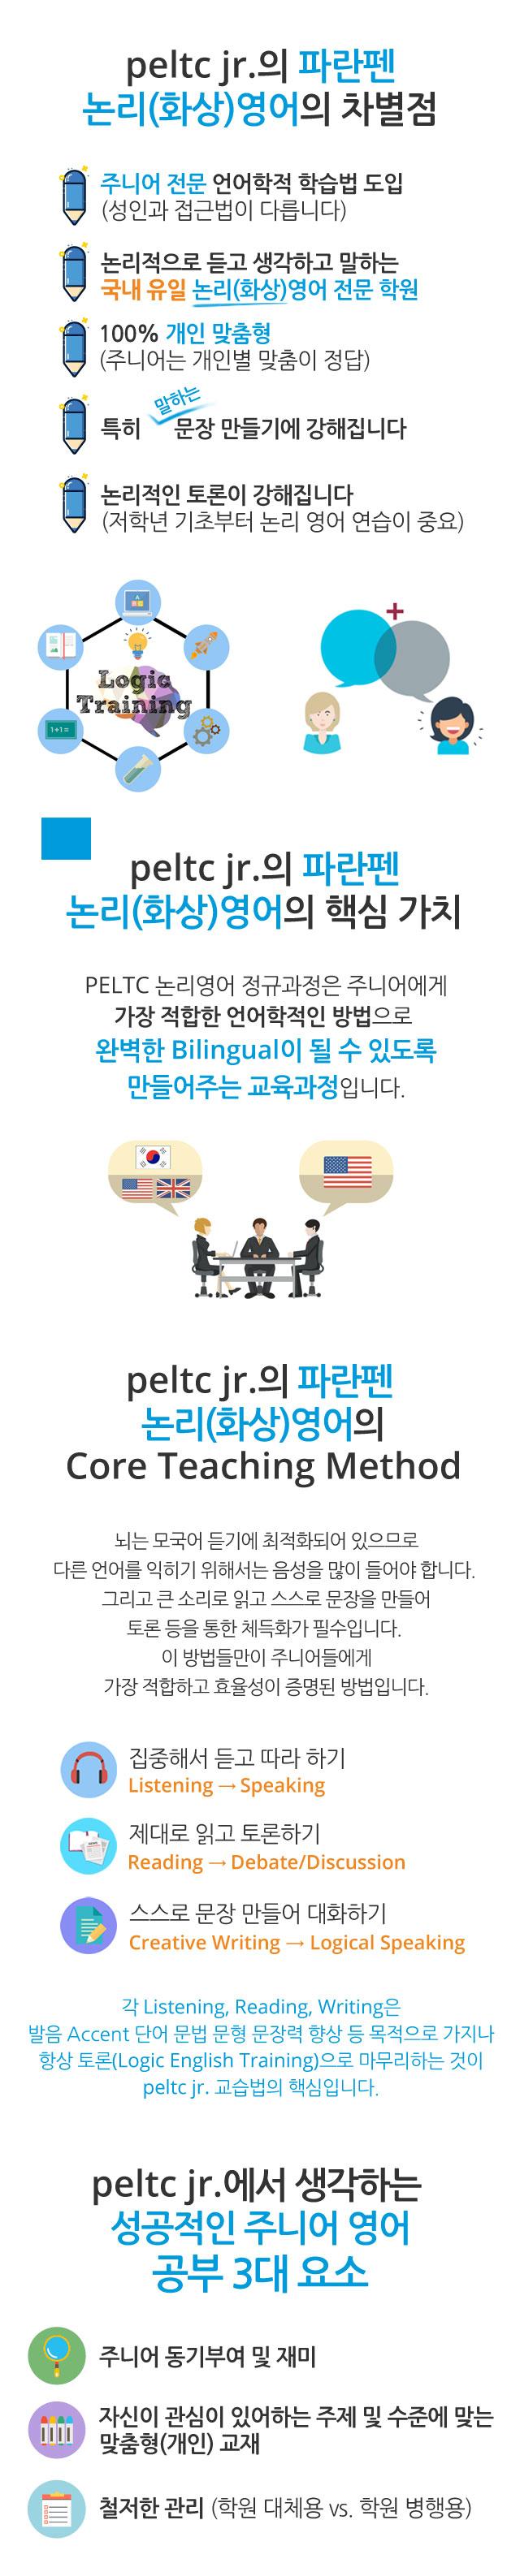 PELTC_mainPage_mob_20170117_02